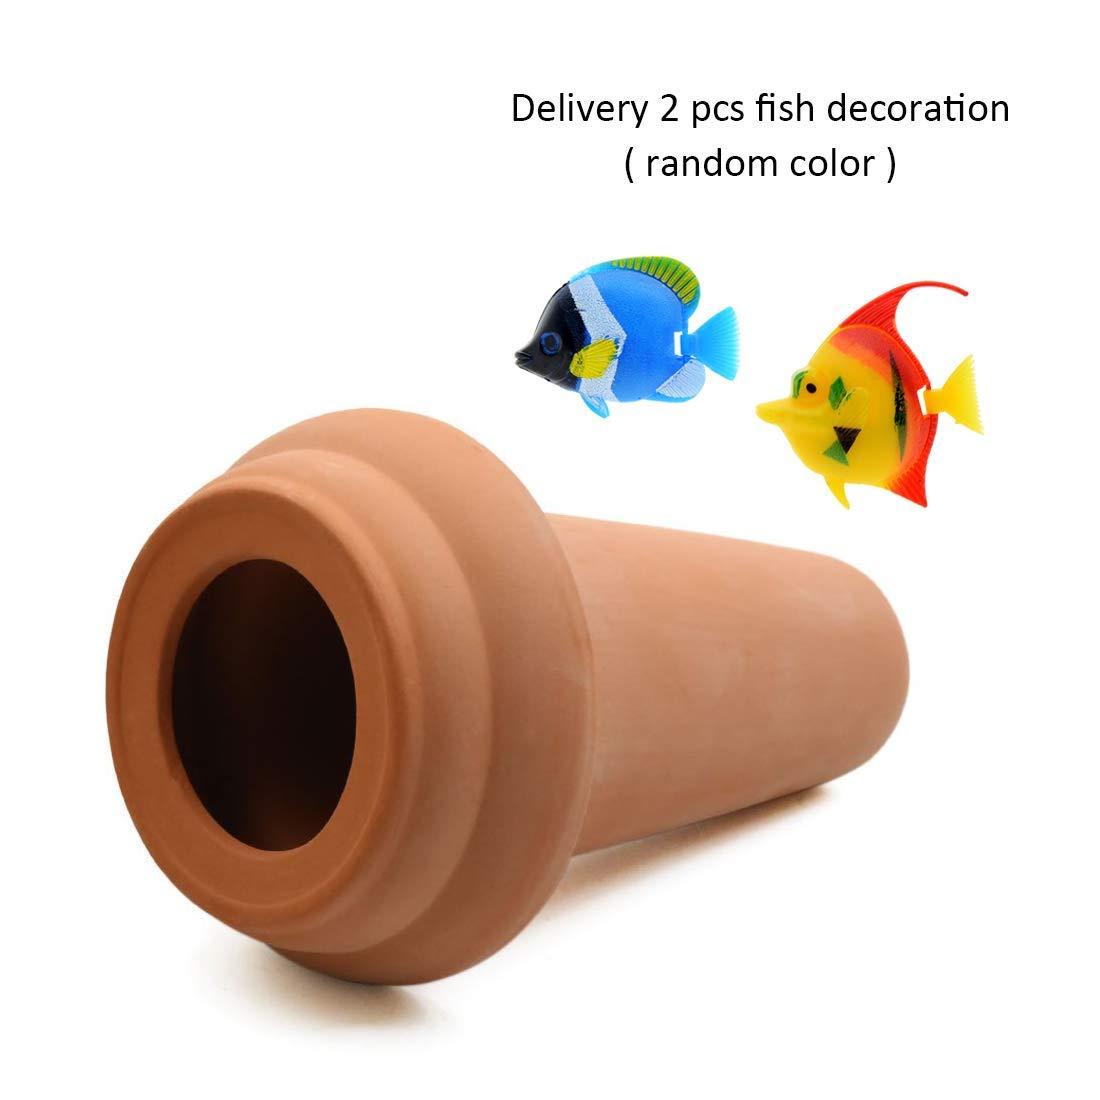 Uotyle Ceramic Spawning Cone 8 Inches Breeding Cones Cave Orange Aquarium Decorations Fish Tank Ornaments for Discus Clownfish Angelfish Aquatic Pets Play Hide Rest